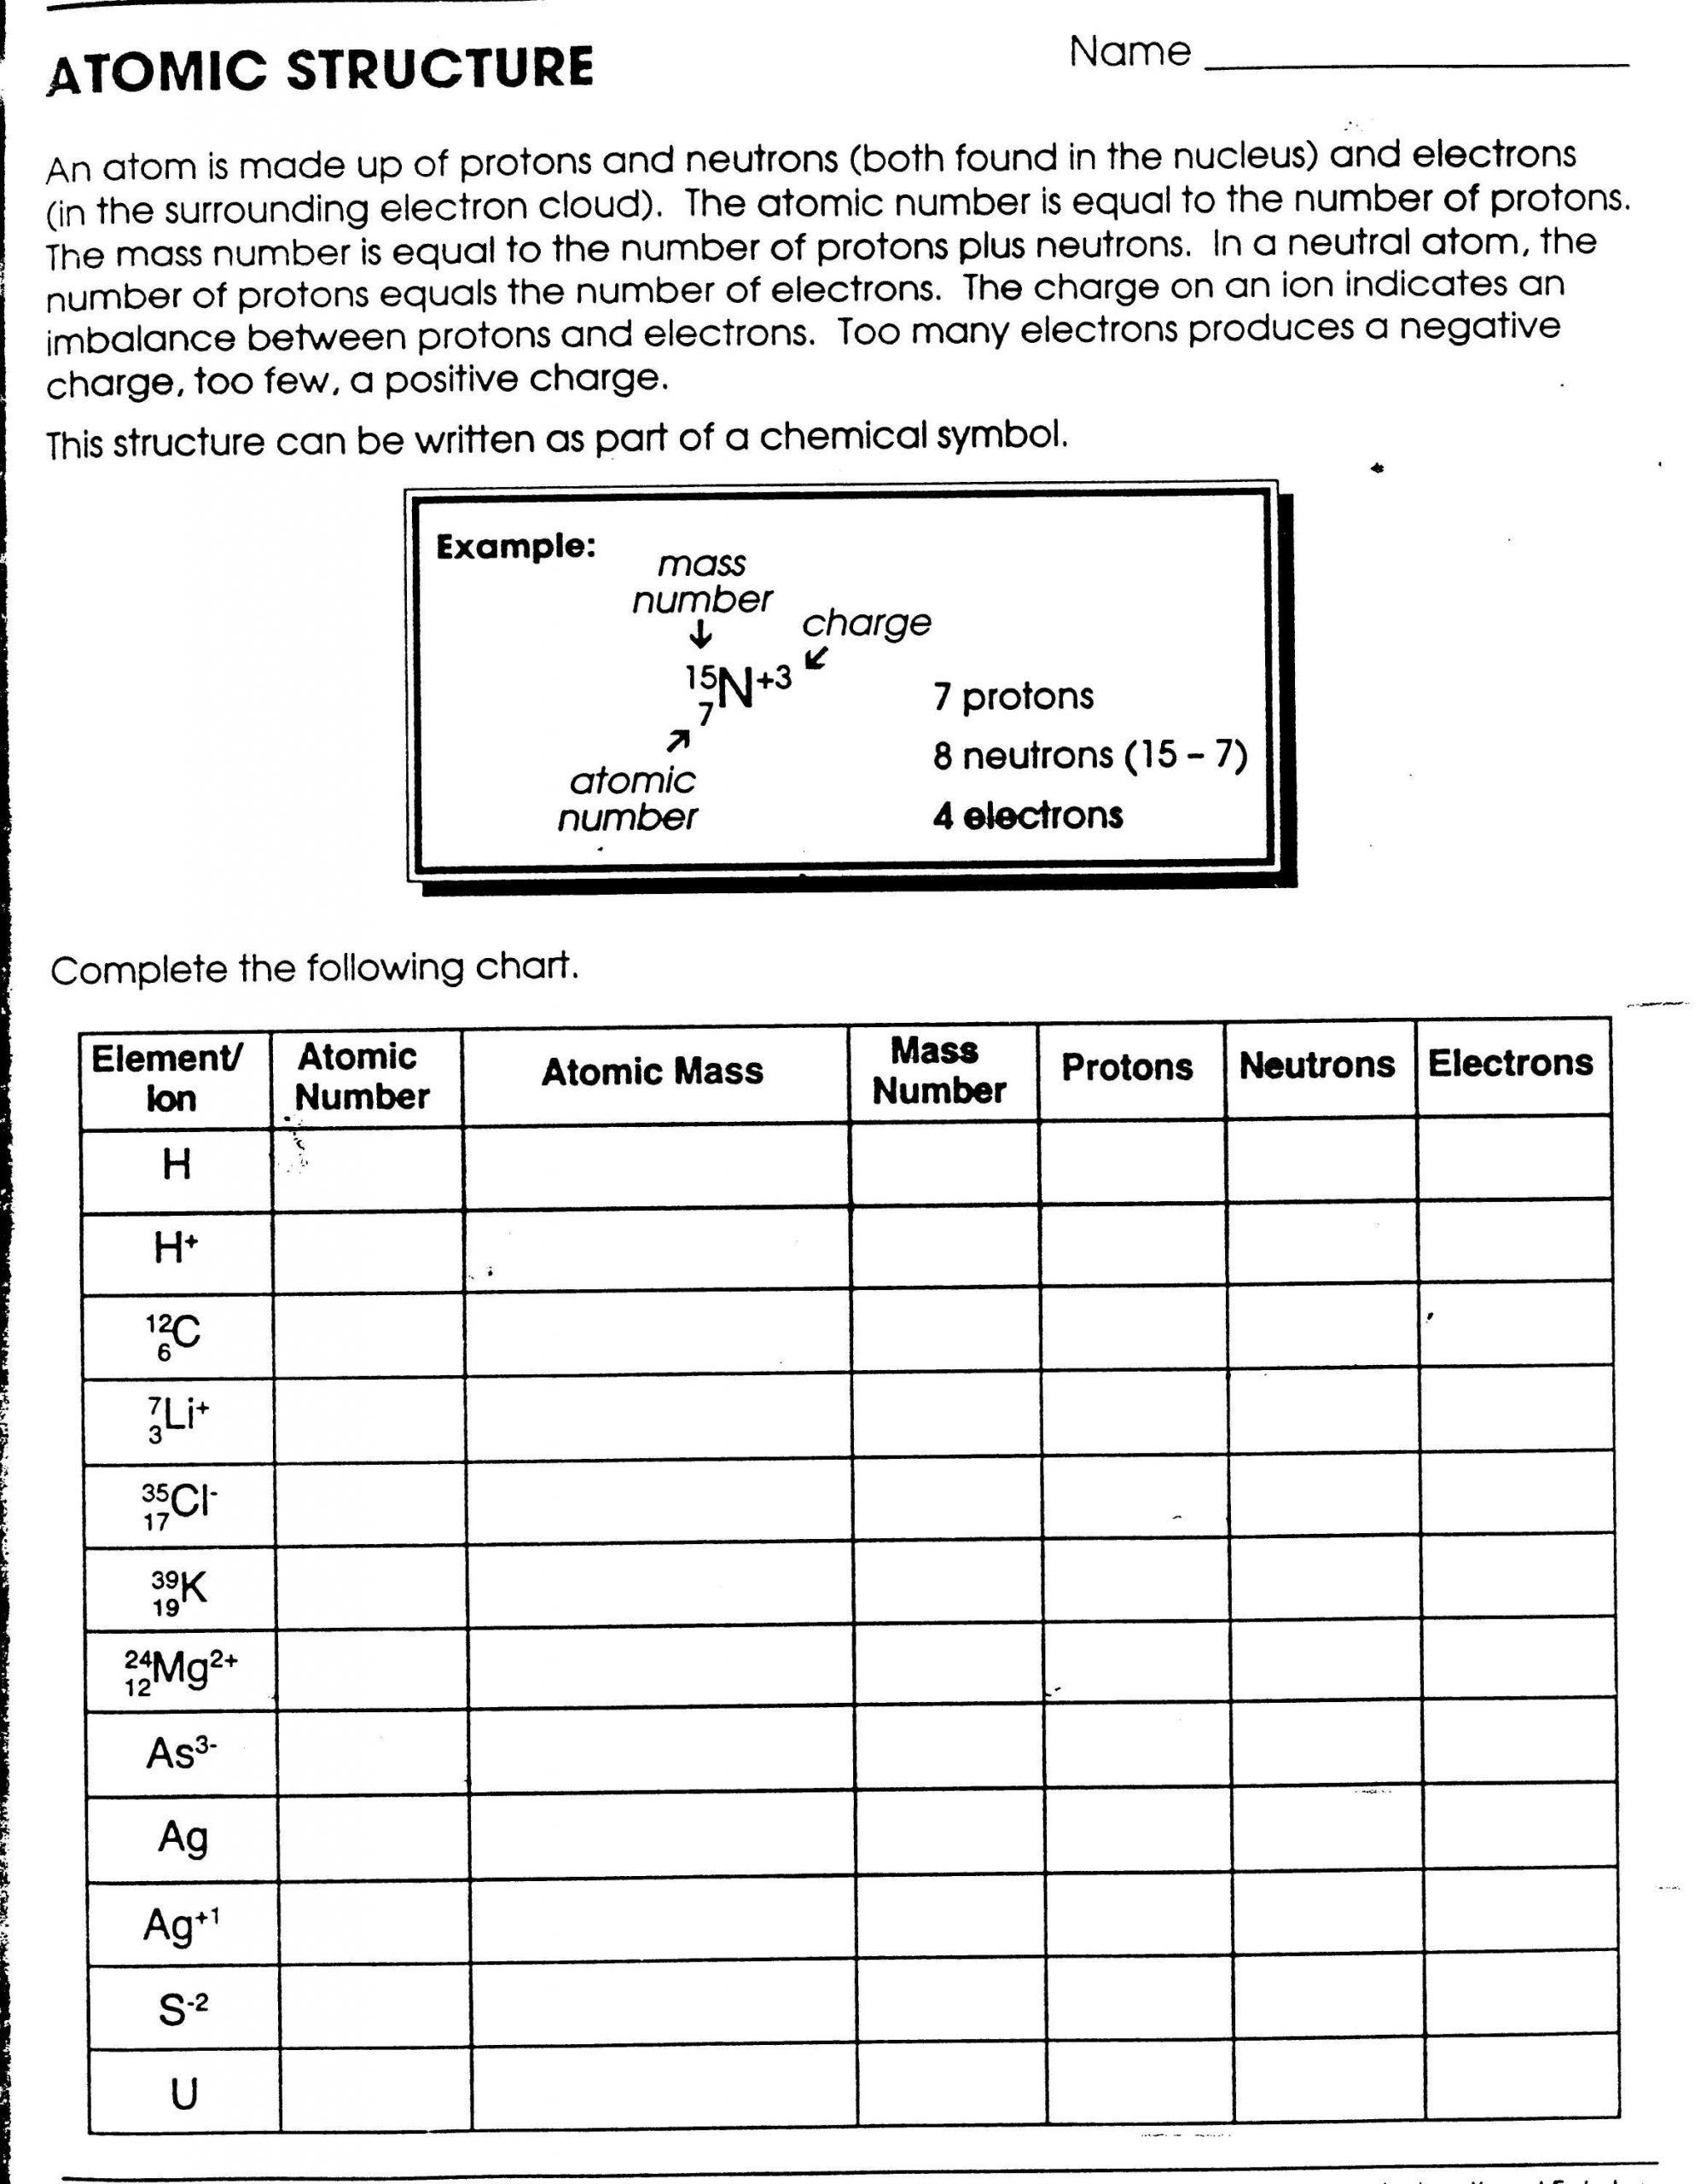 Basic atomic Structure Worksheet Answers Printables atomic Structure Worksheet Gozoneguide